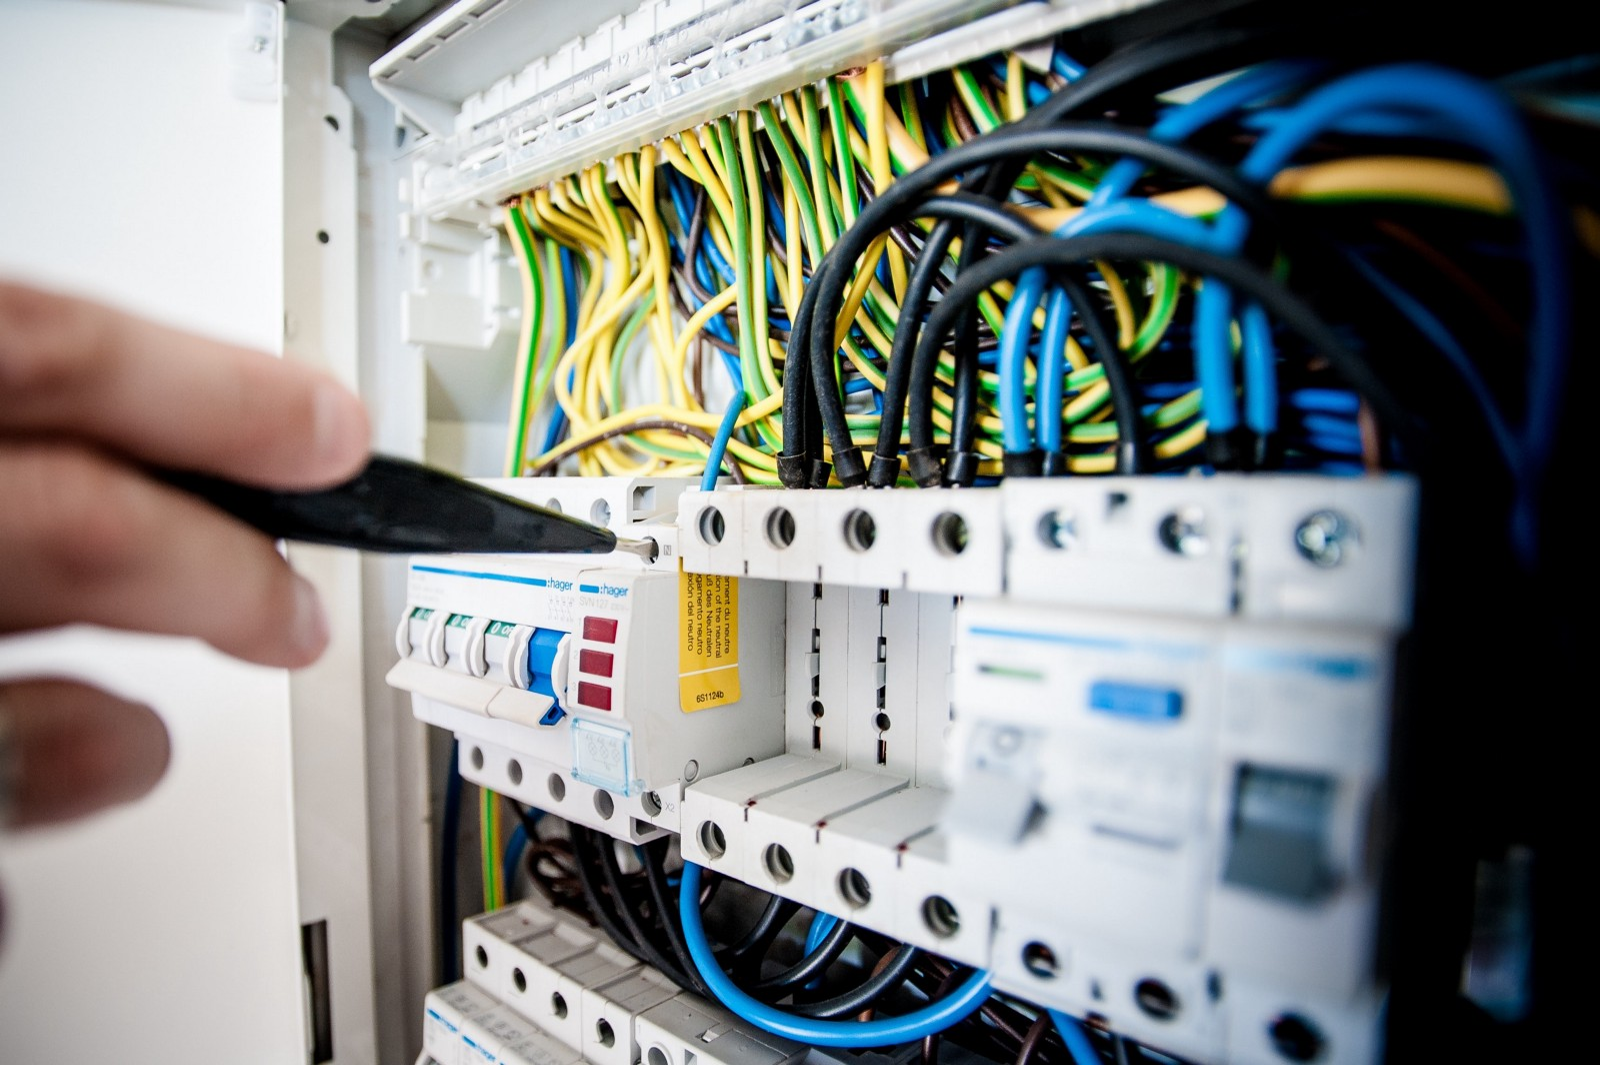 hight resolution of house wiring with fiber optics wiring diagrams trigg house wiring with fiber optics